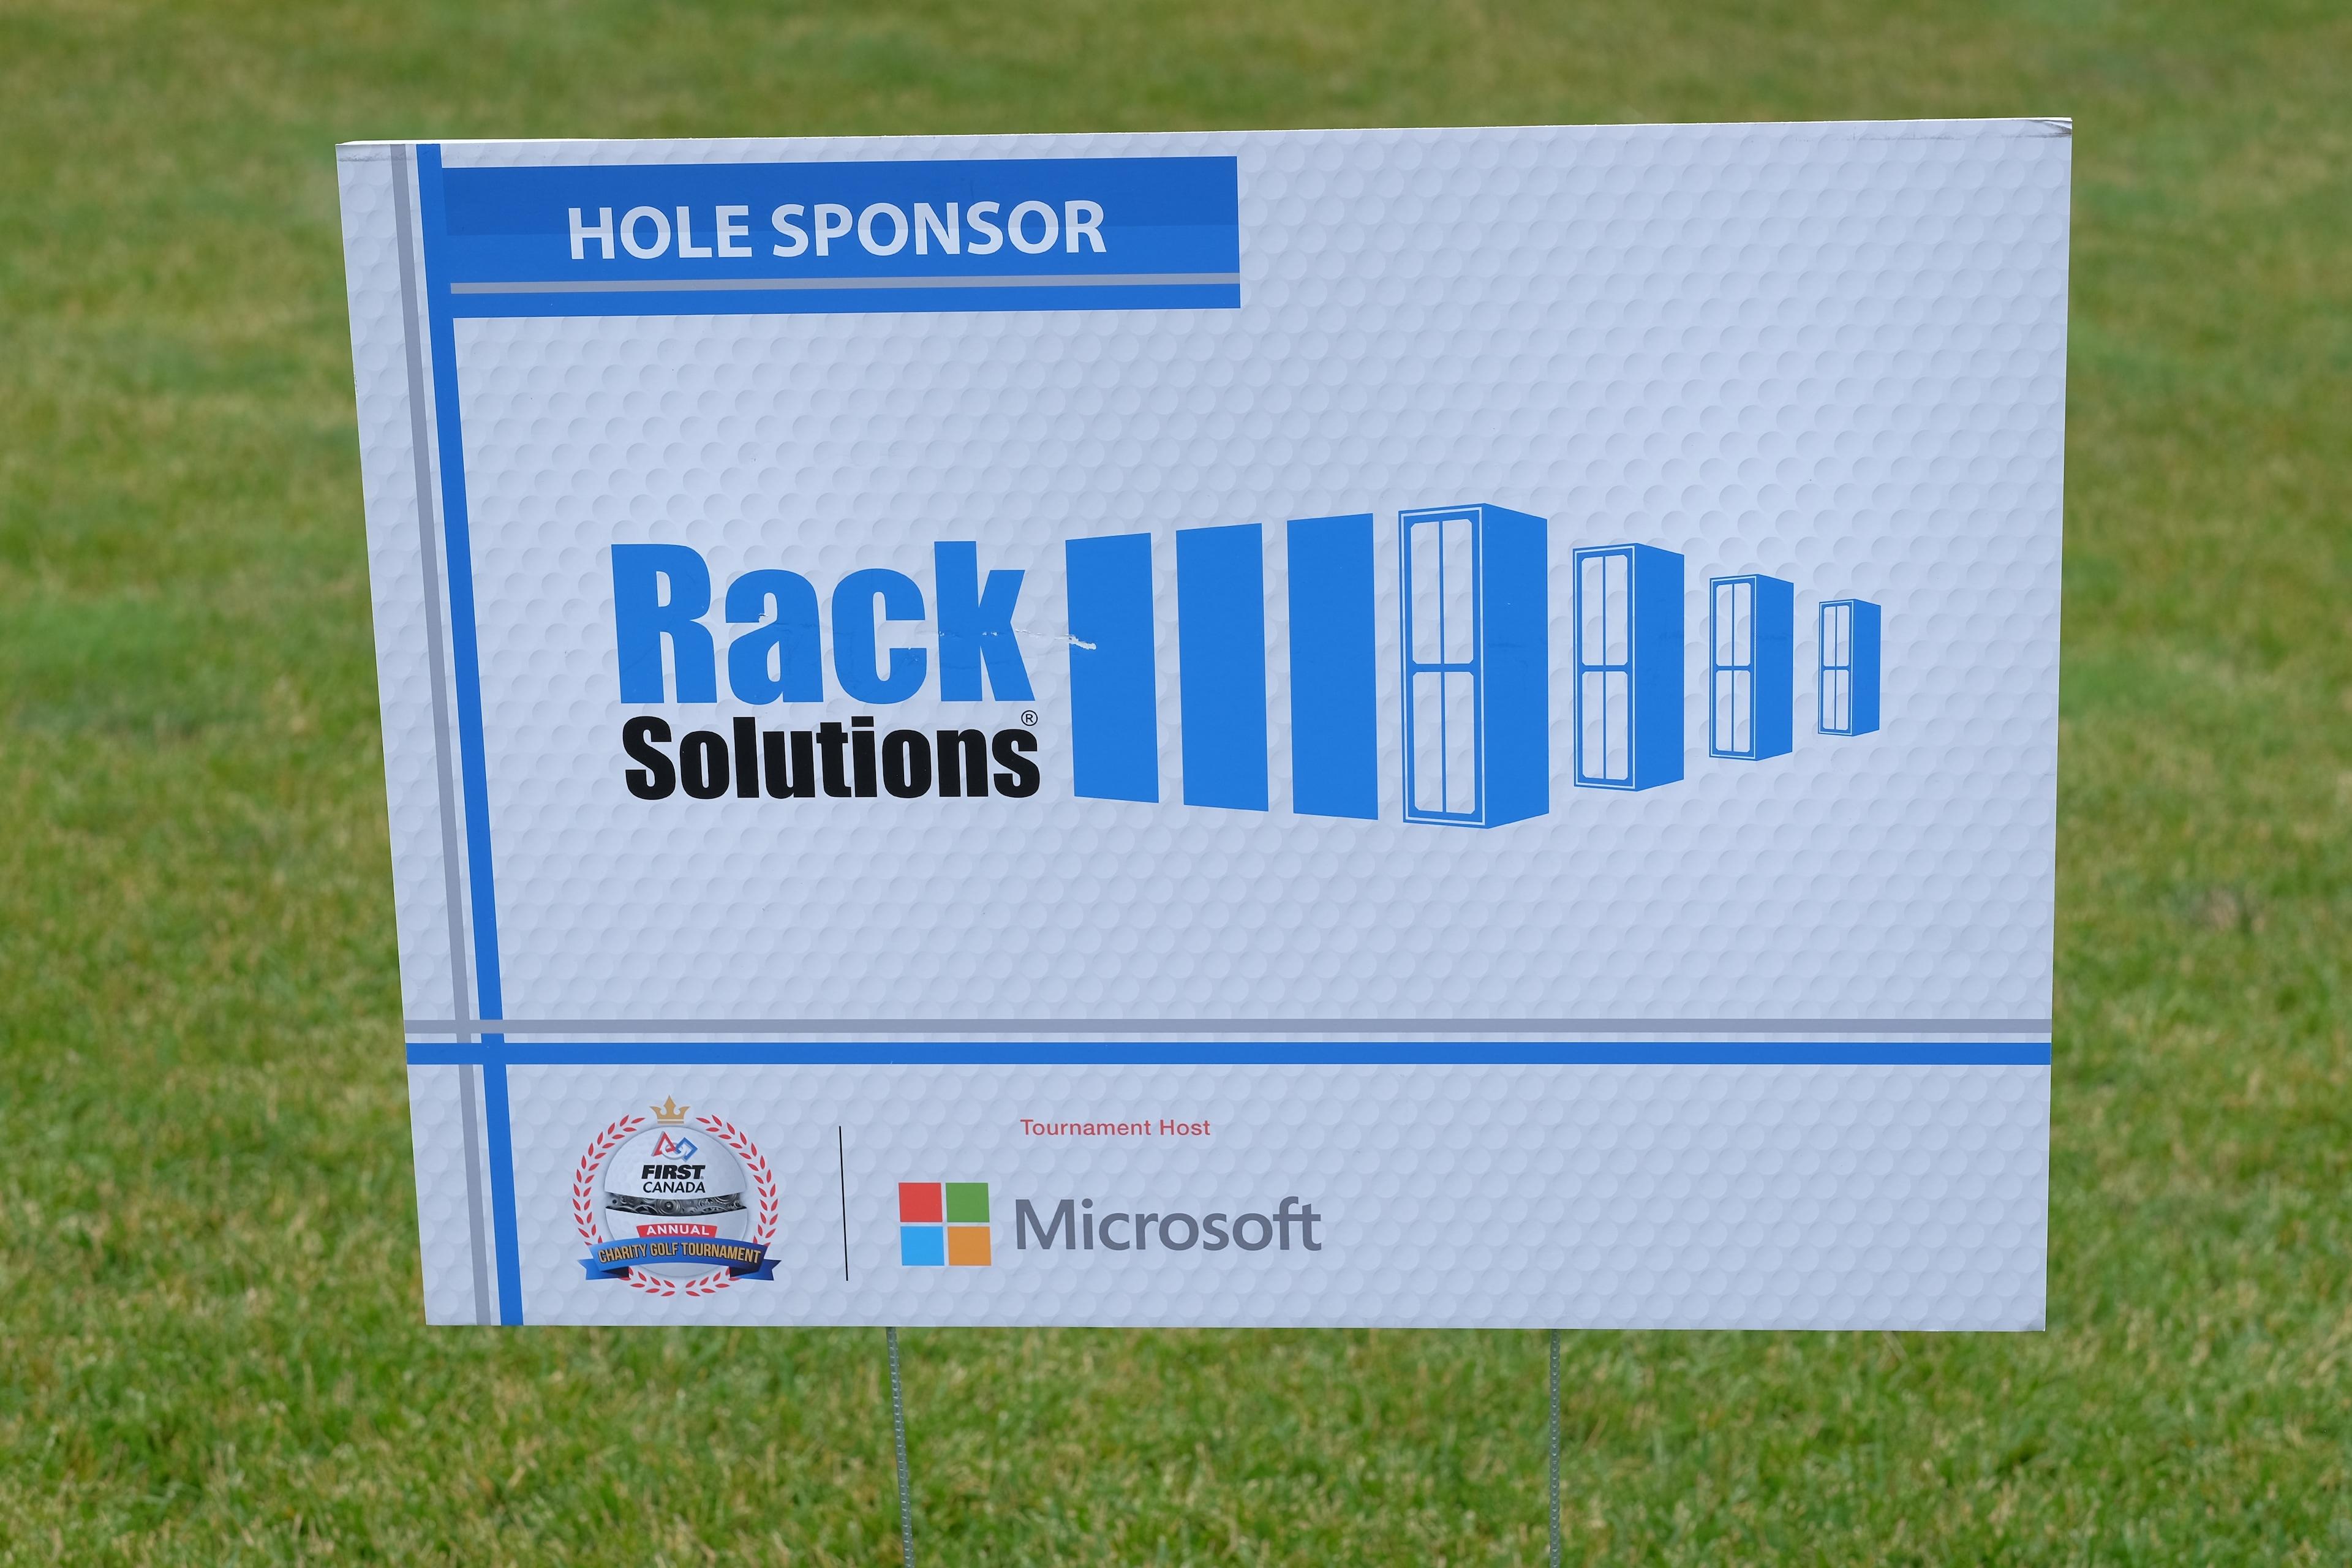 RackSolutions Hole Sponsor